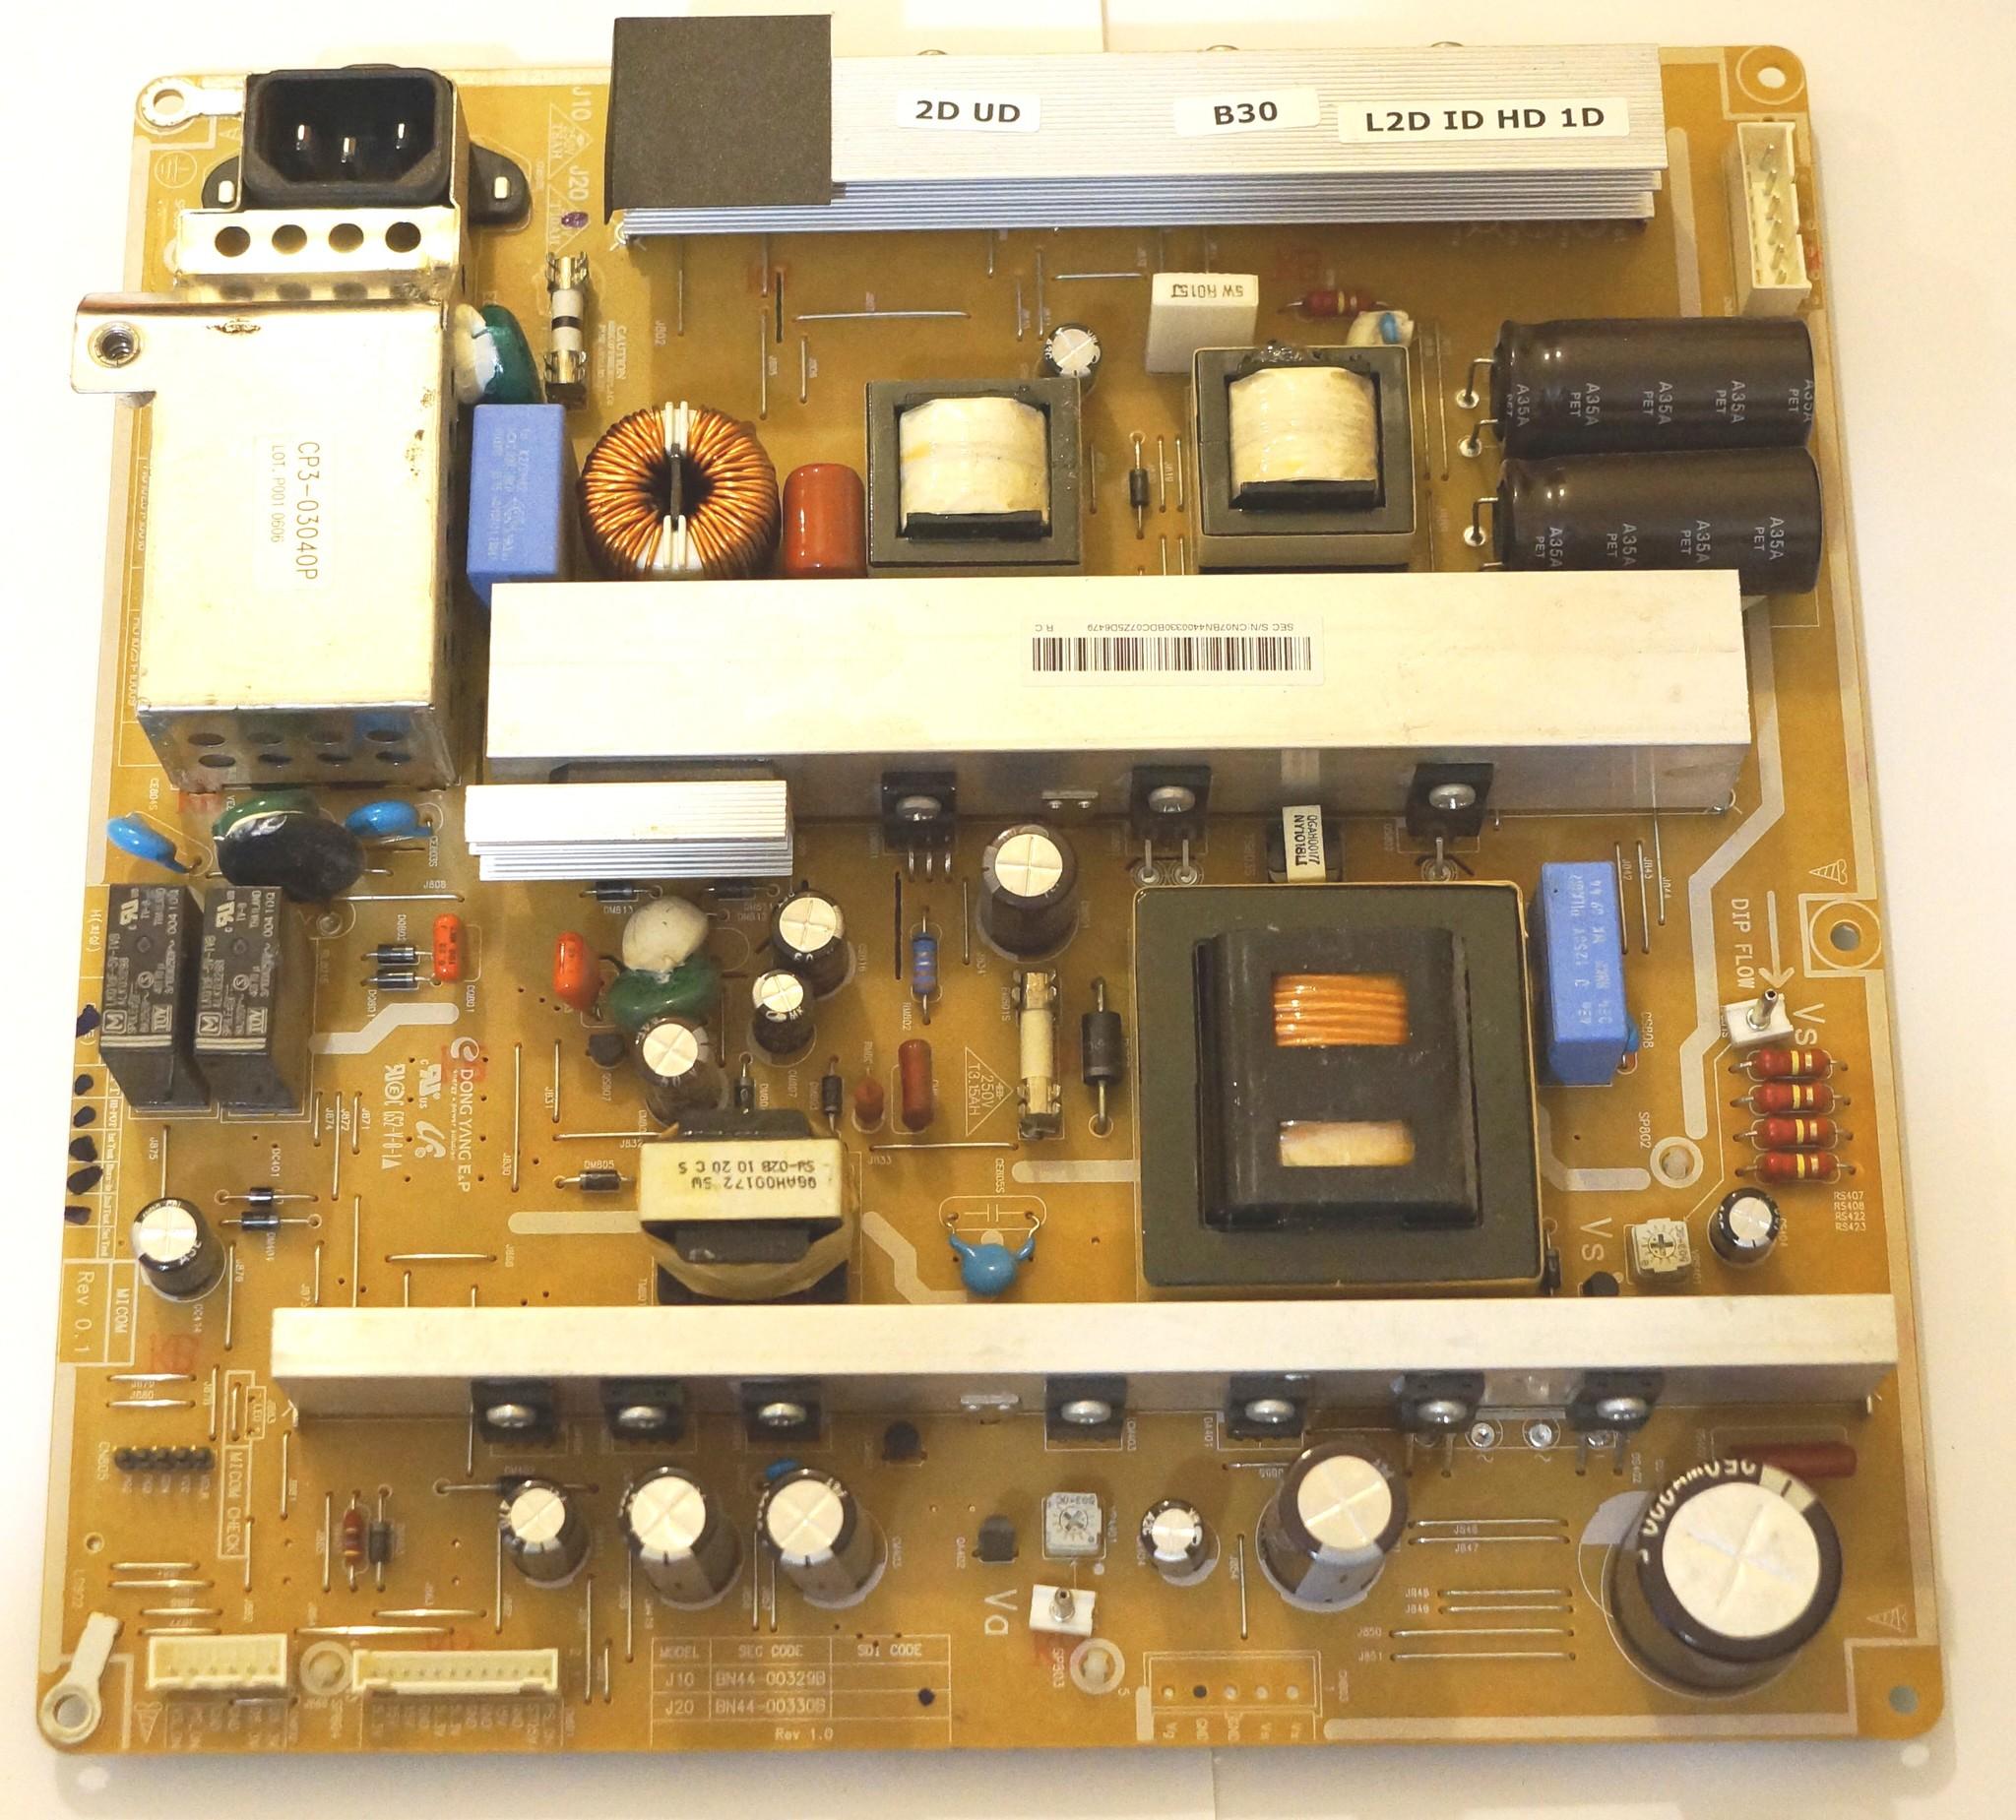 Ремонт блока питания телевизора самсунг